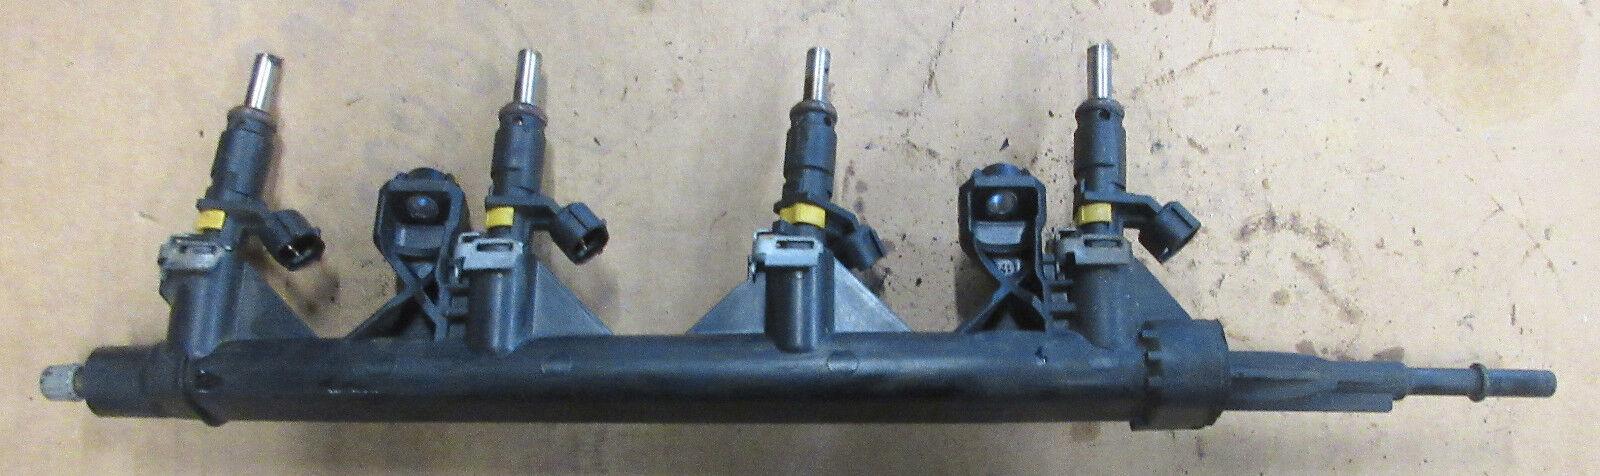 Genuine Used MINI Petrol Fuel Rail for (N12 N16) R56 R55 R57 R58 R59 - 7575646